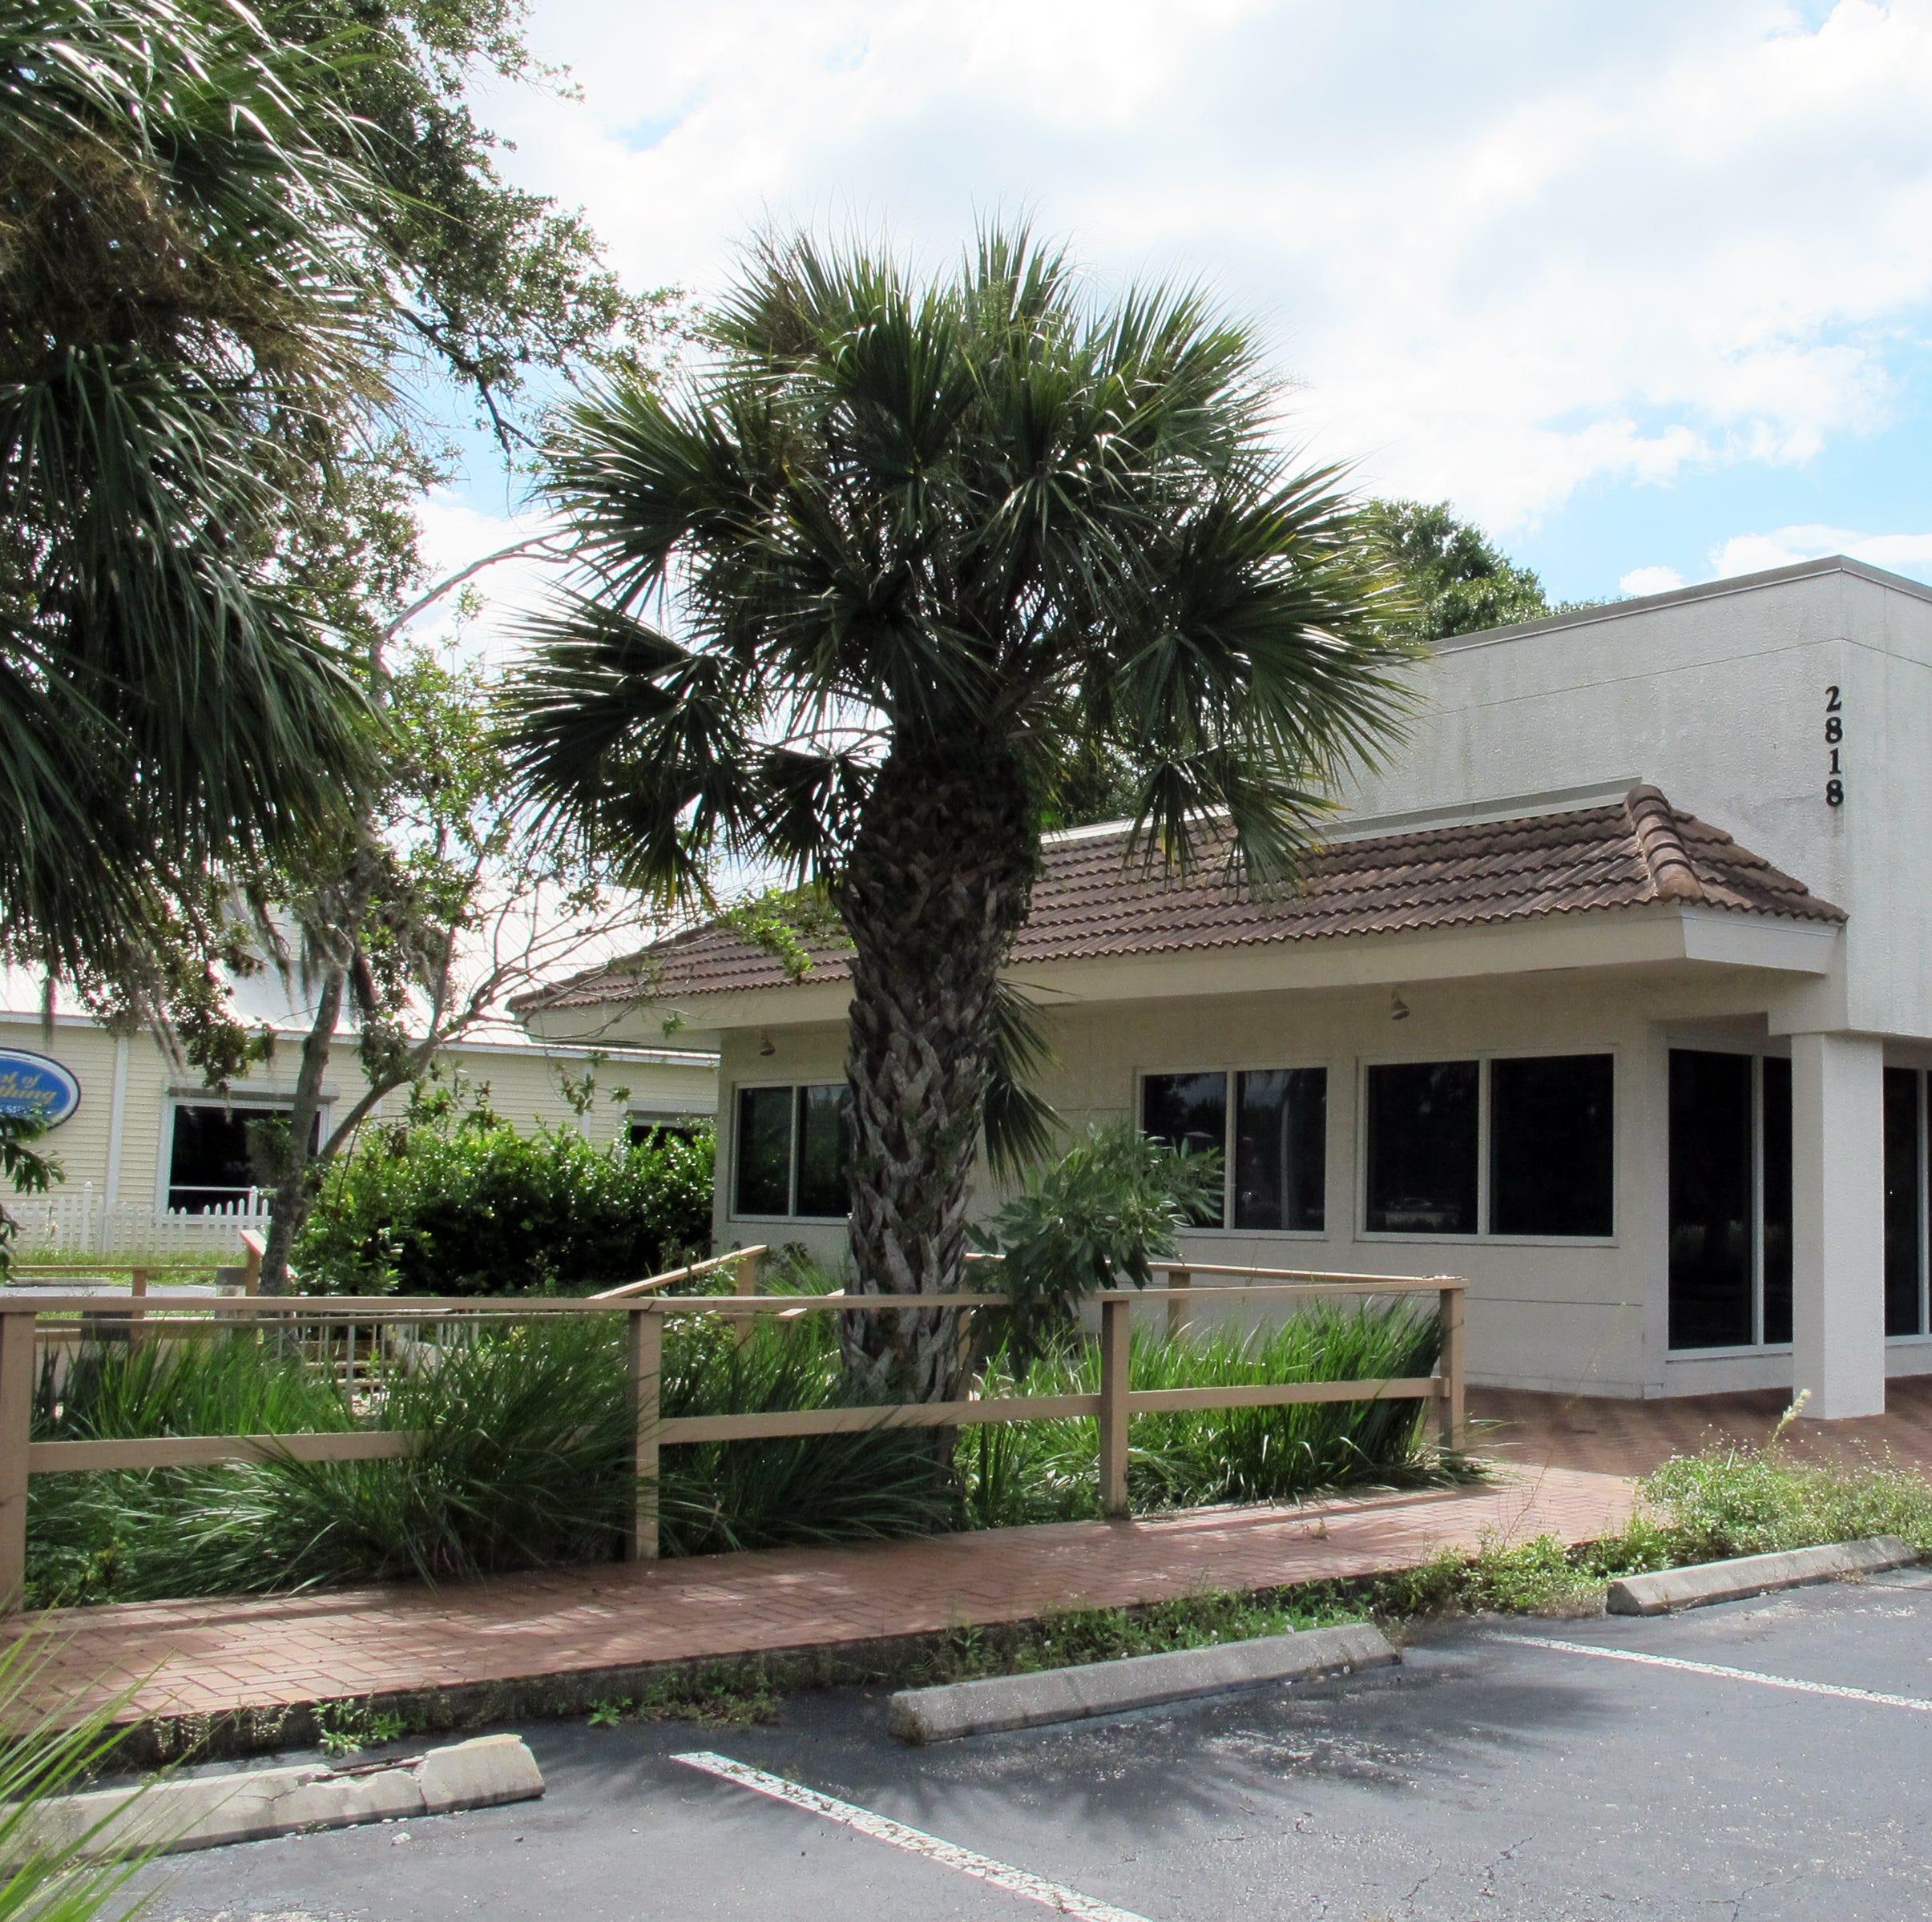 Popeyes location still a possibility in Bonita Springs